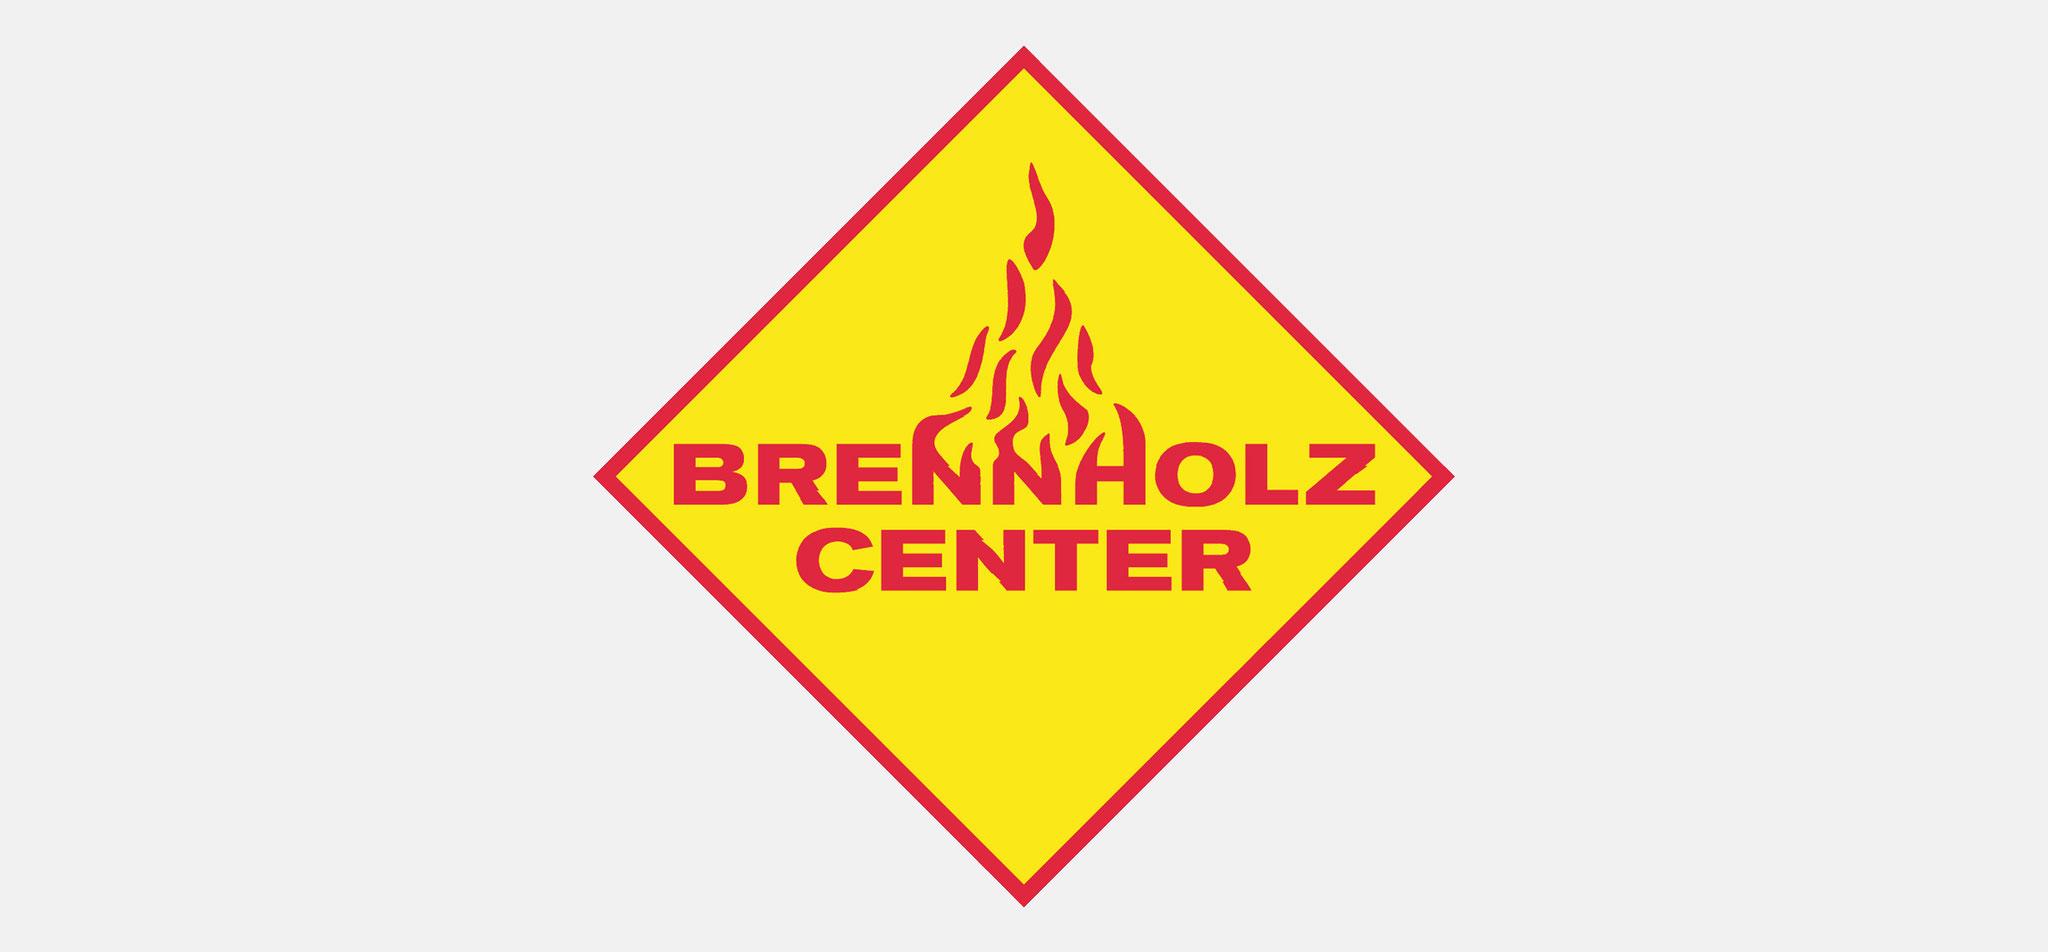 BRENNHOLZCENTER | logo bhc, farbe – infragrau, gute gestaltung